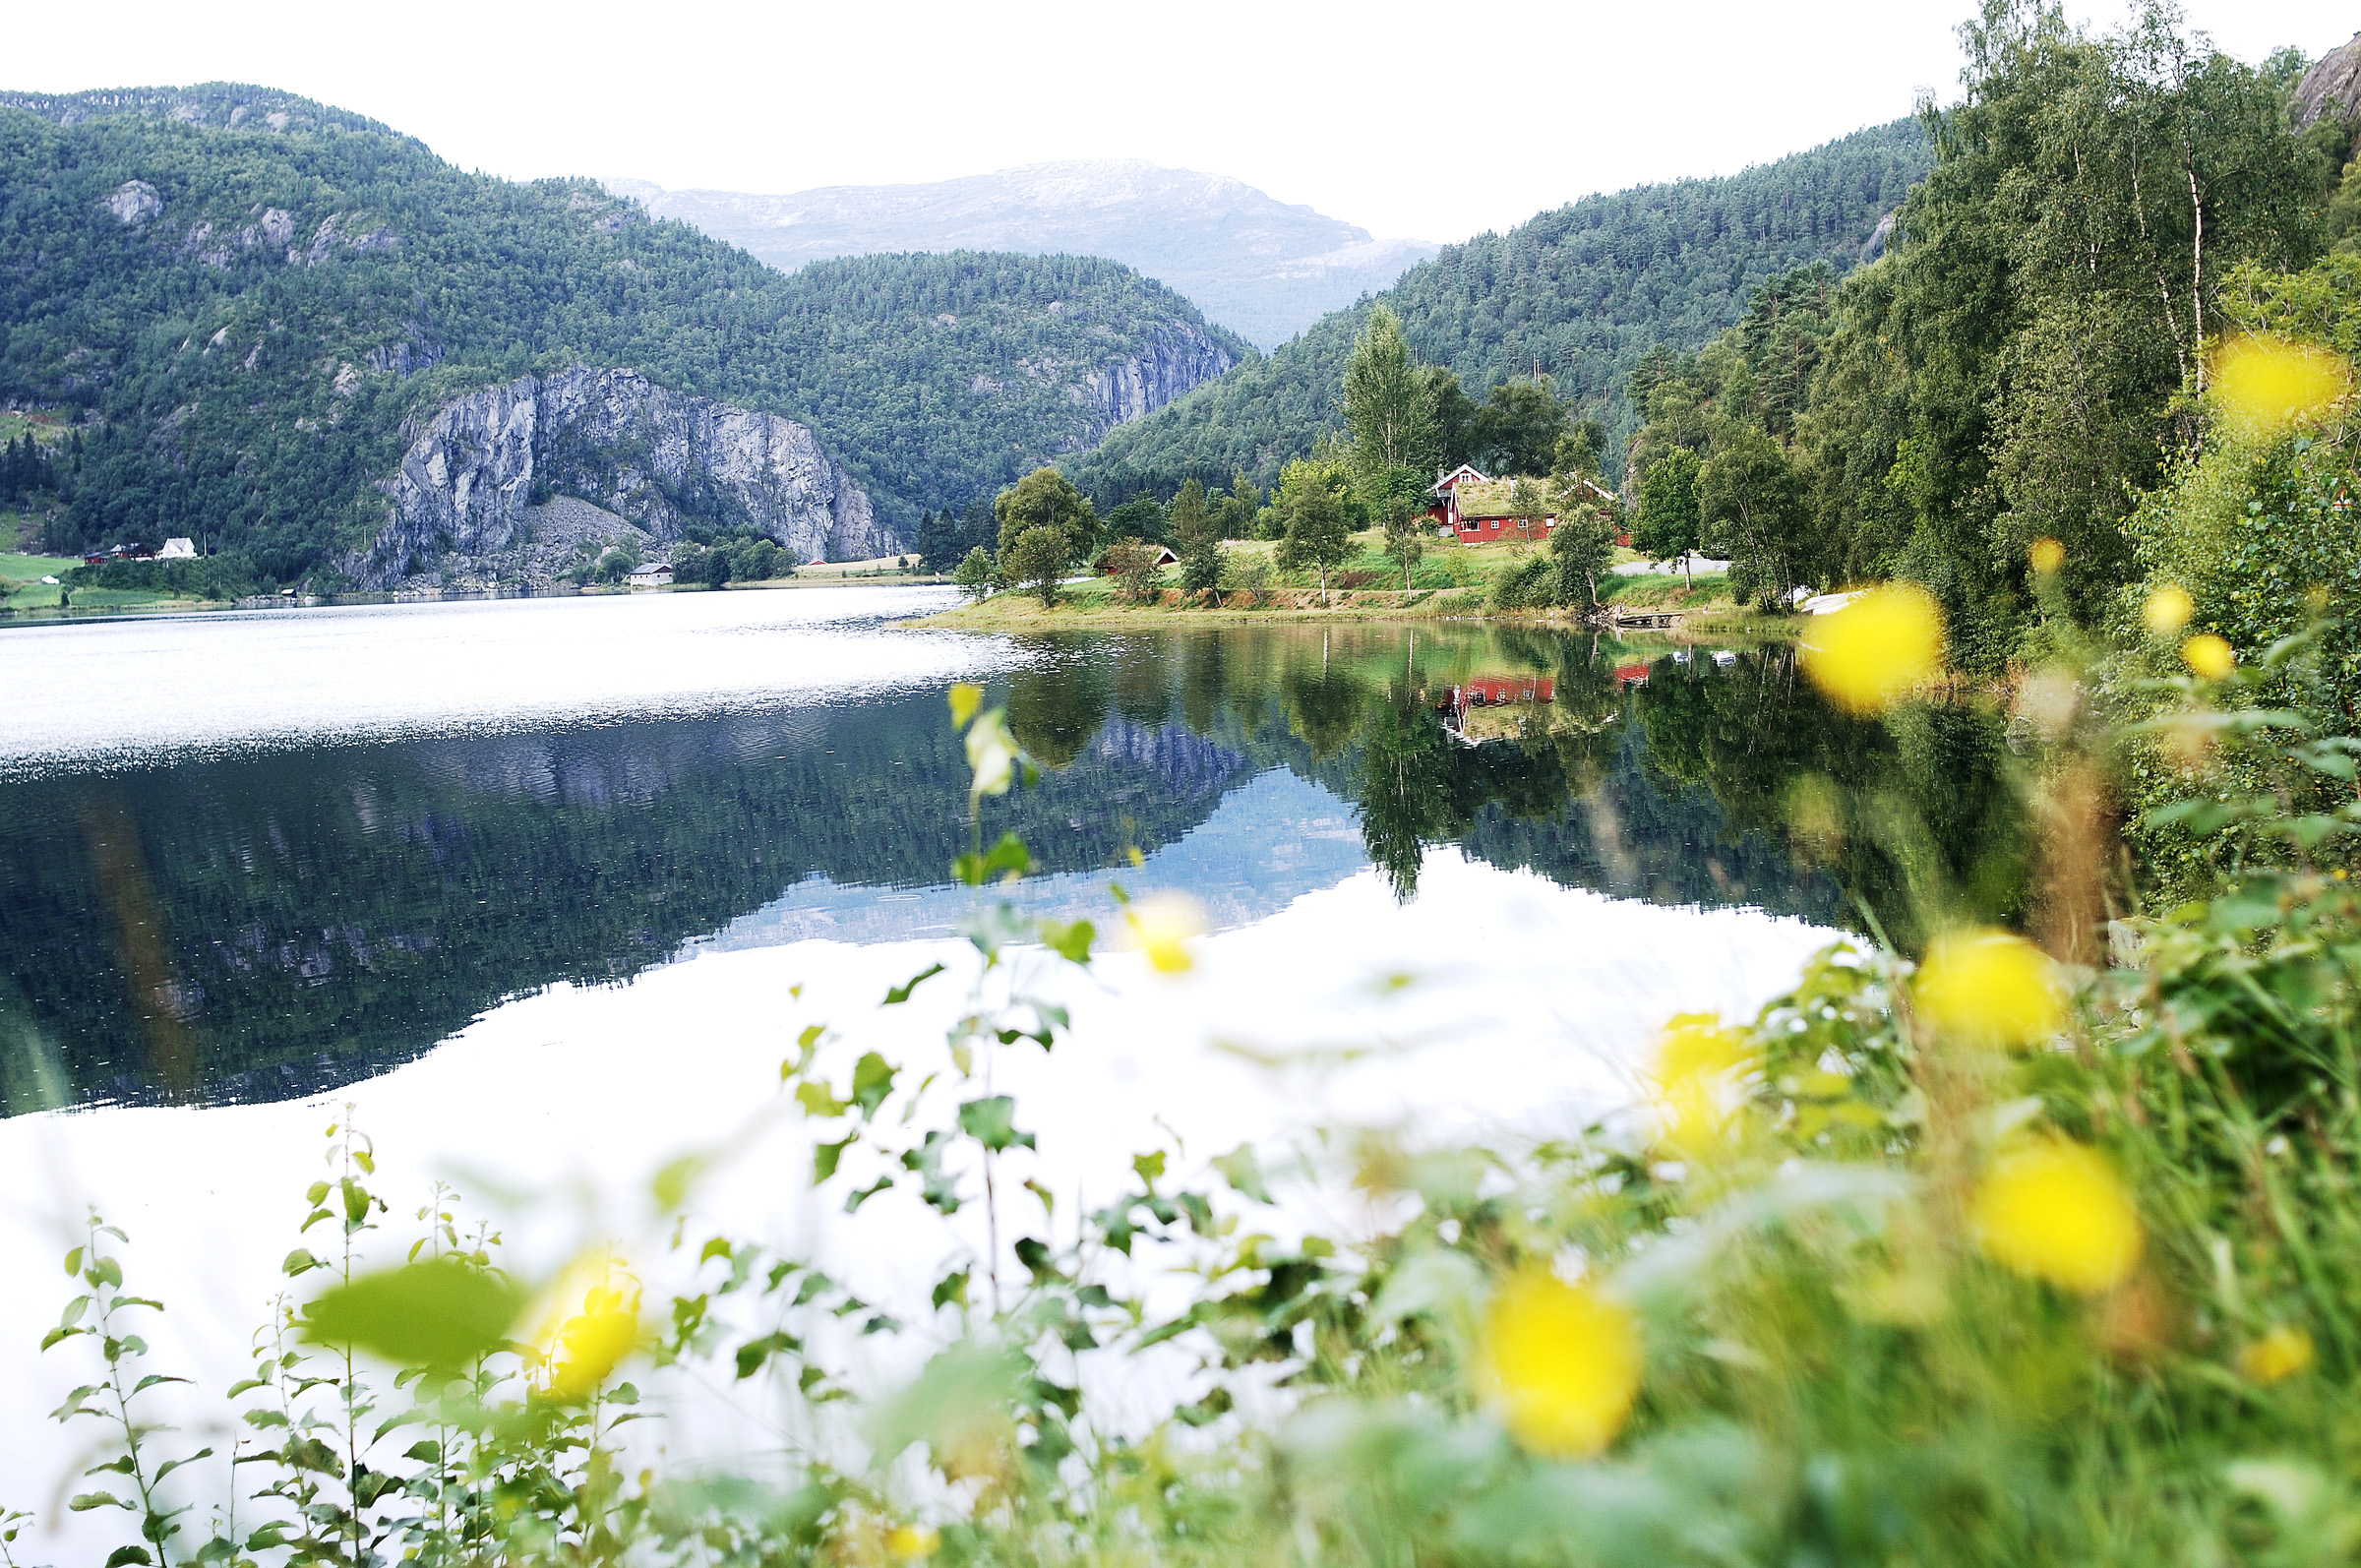 Bilde av Suldalsvatnet